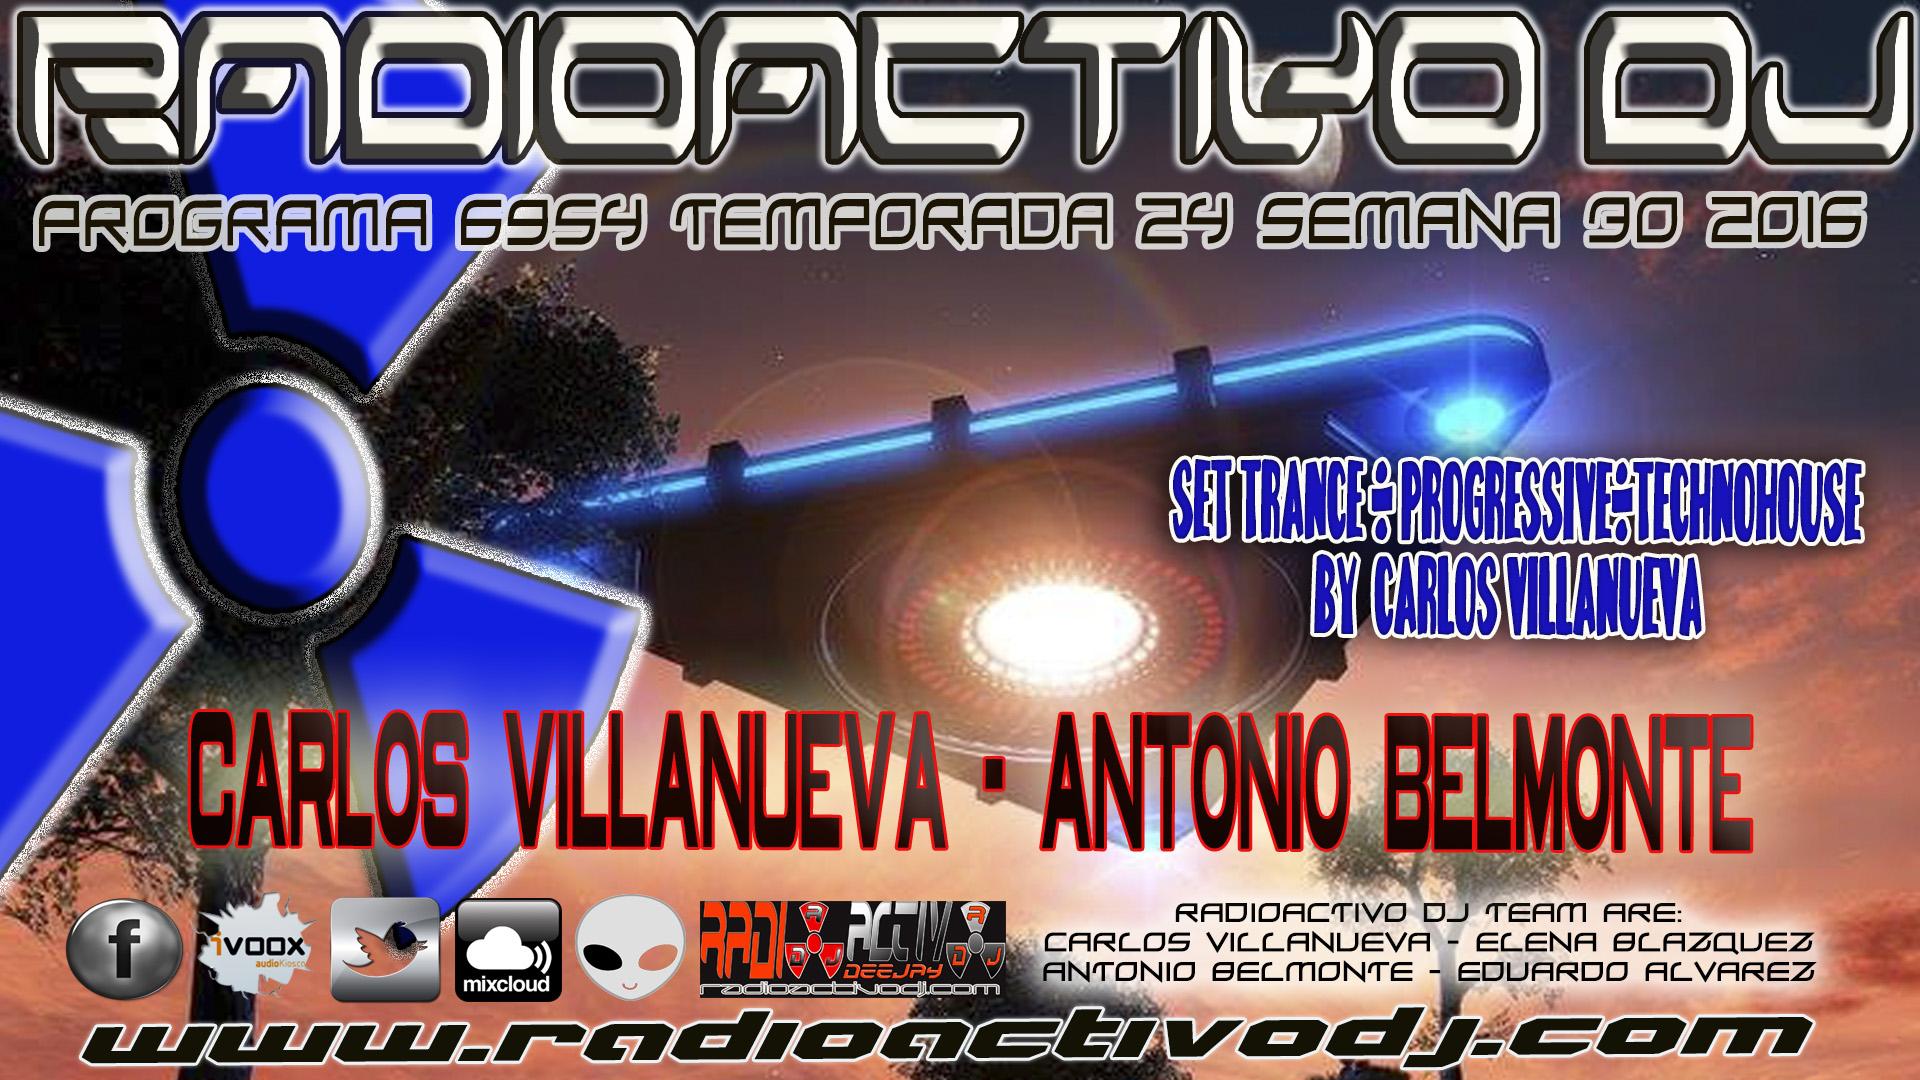 RADIOACTIVO-DJ-30-2016